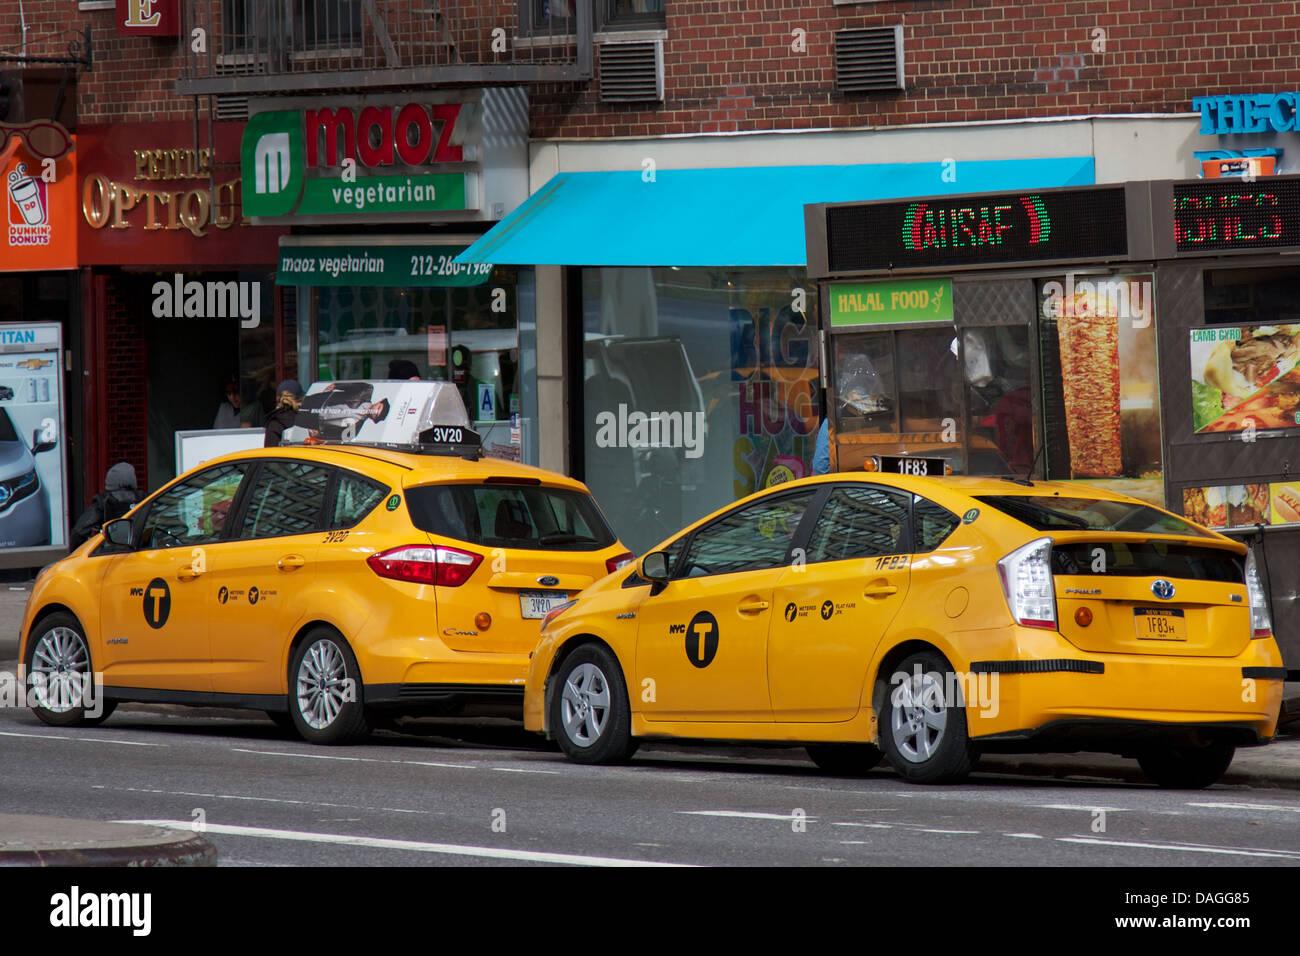 Nyc Medallion Taxi Stock Photos & Nyc Medallion Taxi Stock